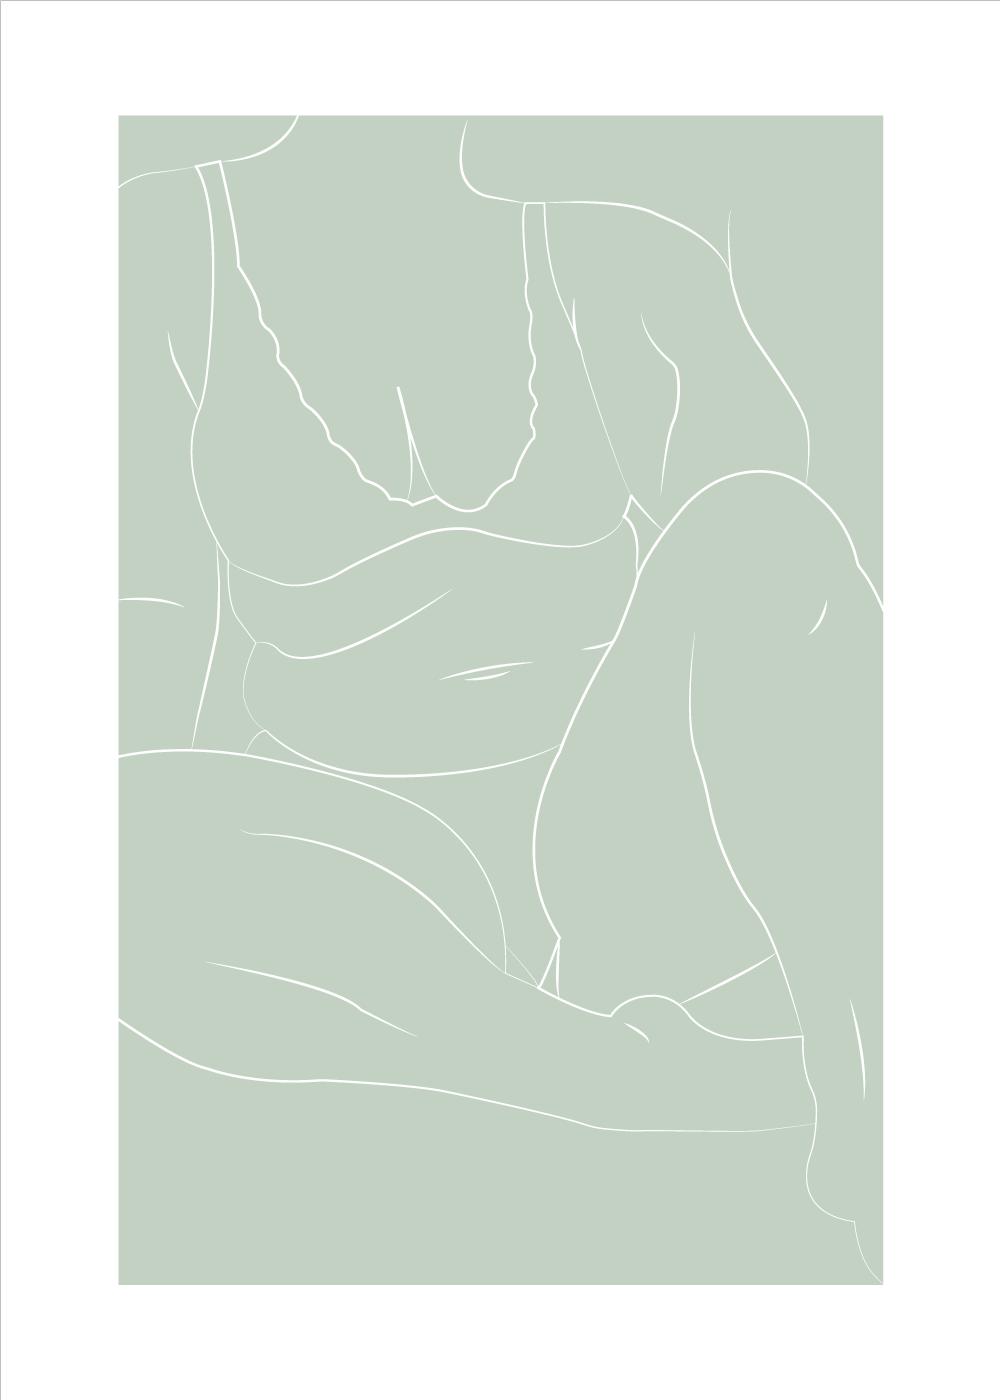 Sarah Frost - Body positivity plakat i grøn